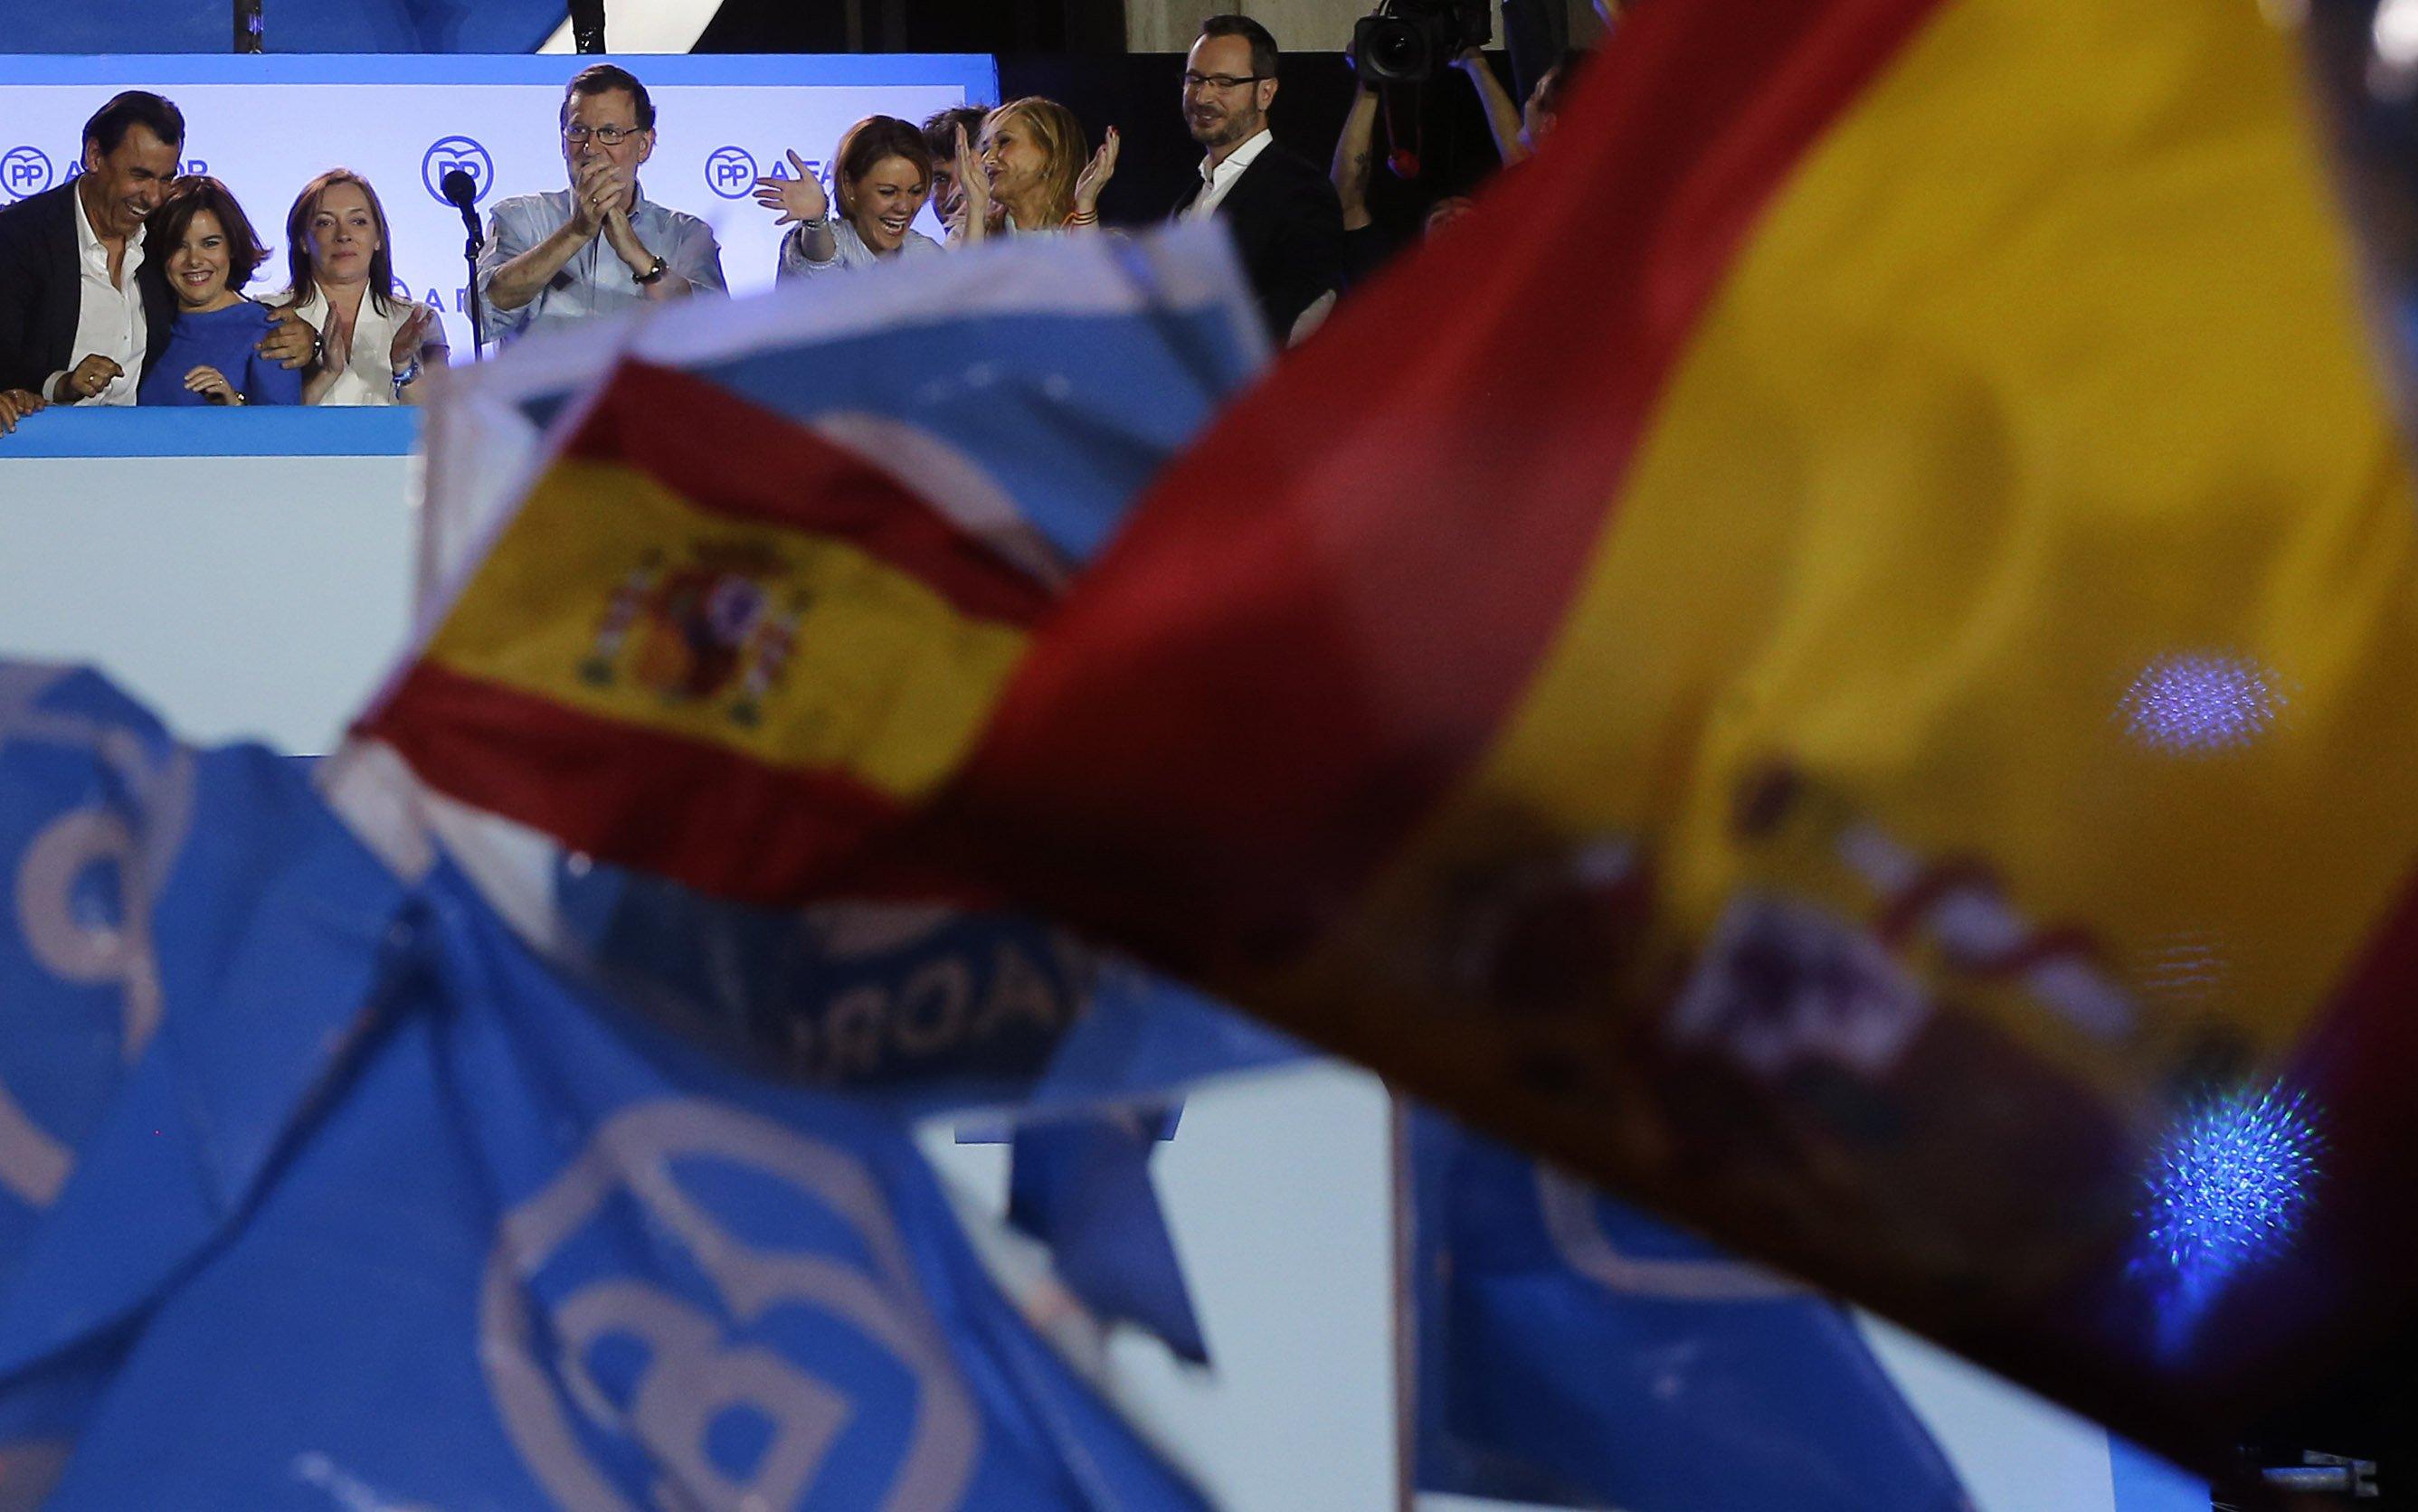 Spain's economy grew estimated 0.7 pct in second quarter